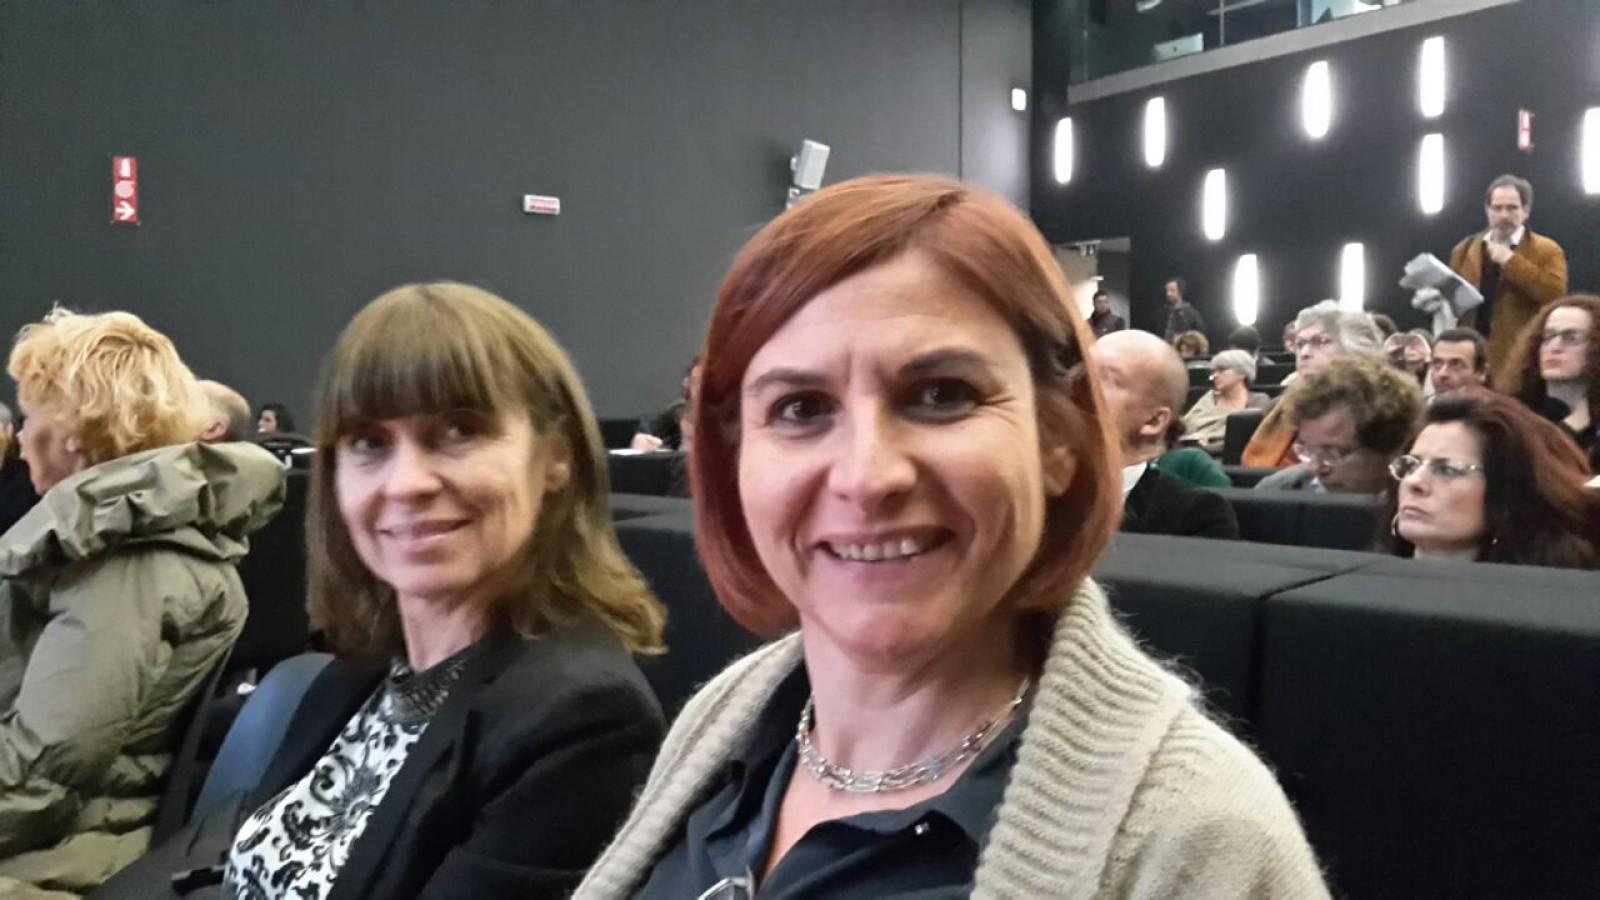 Emilia Garda and Marika Mangosio by Caterina Franchini.